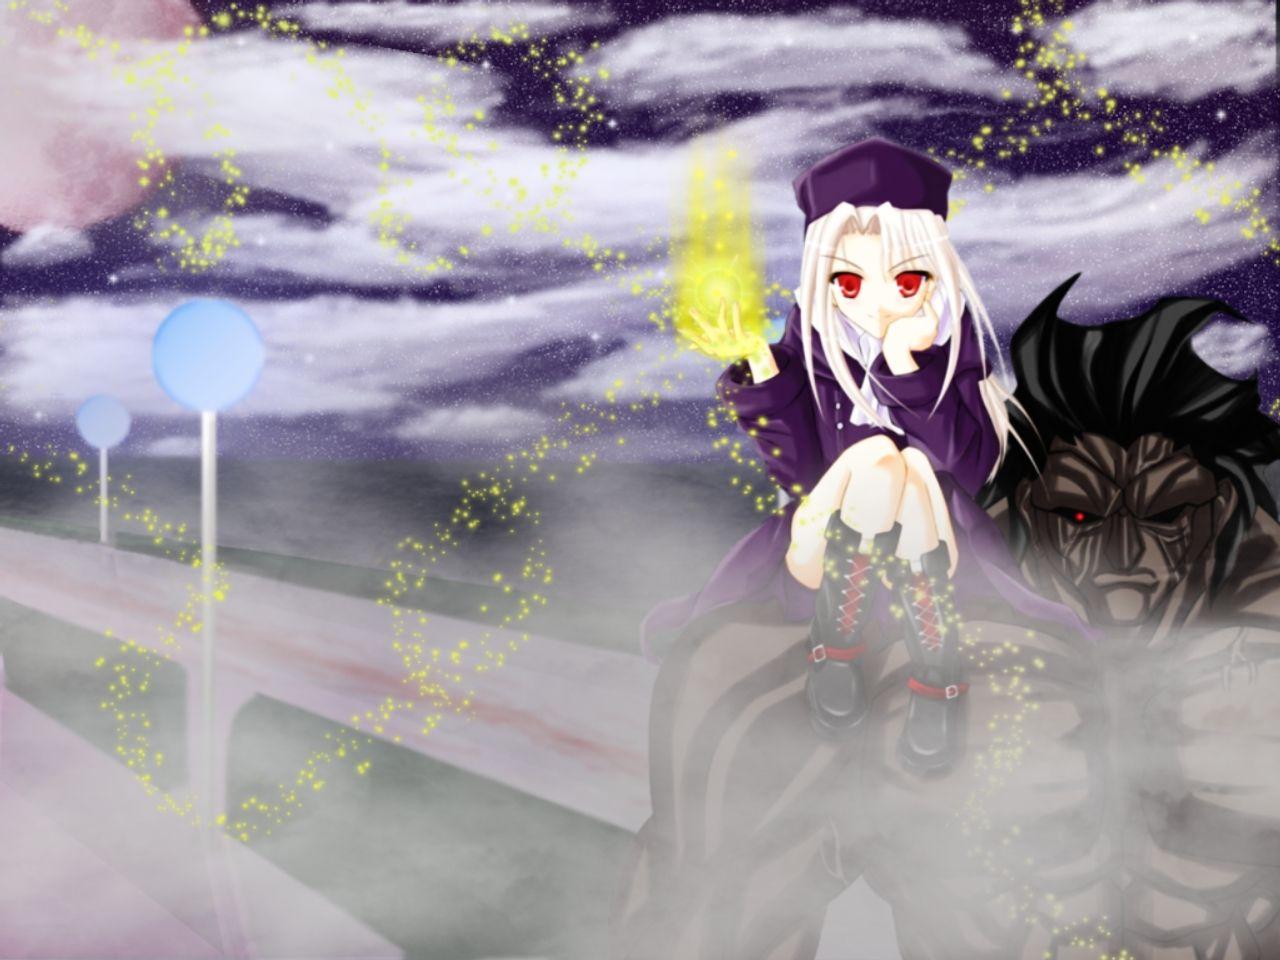 Minitokyo_Fate-Stay_Night_Wallpapers_222110.jpg